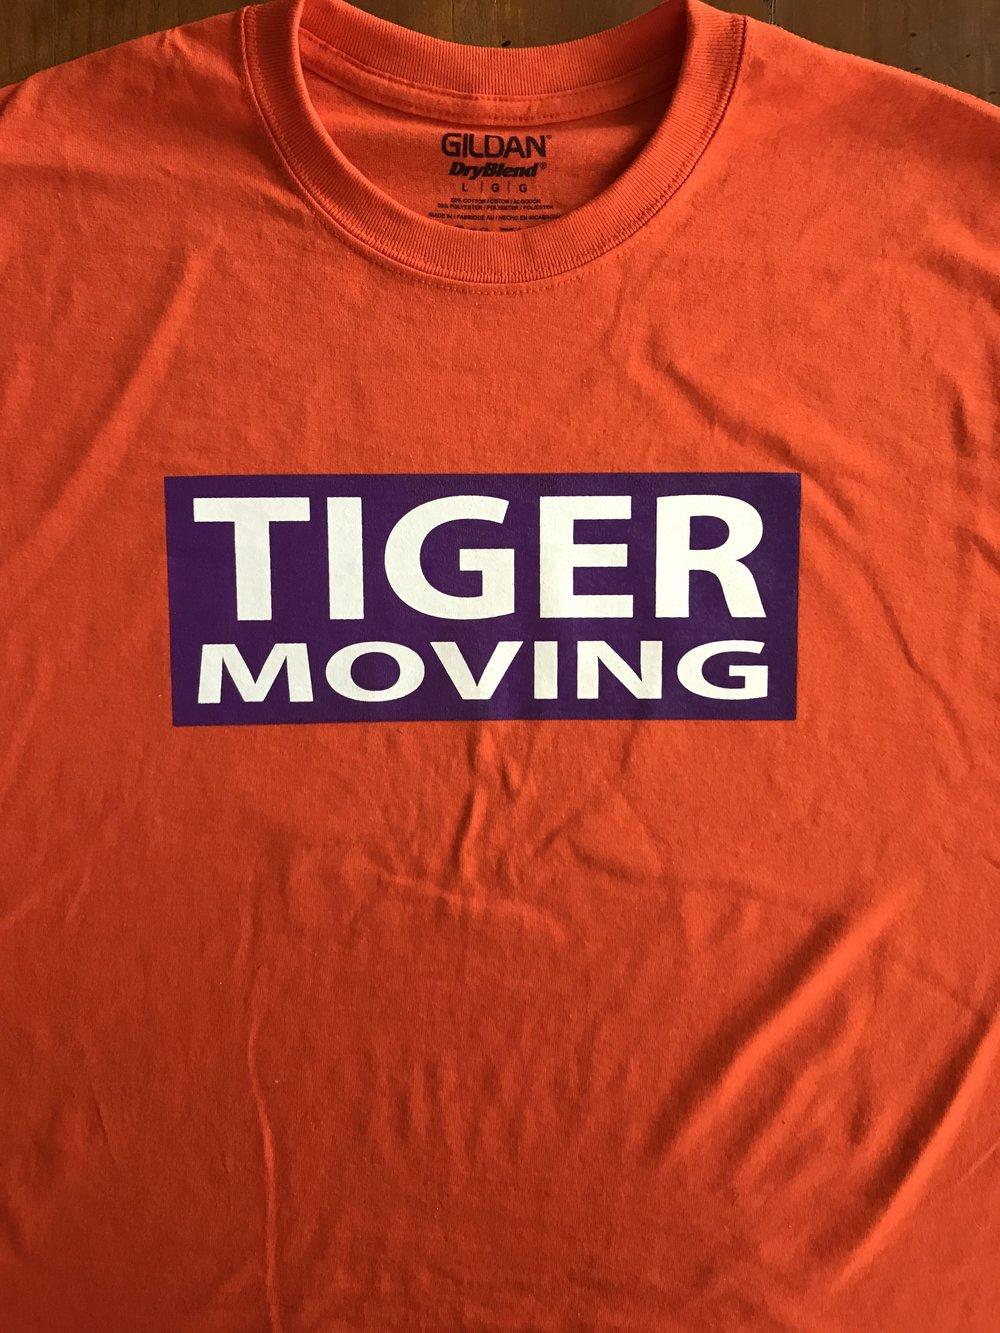 tiger moving front.JPG